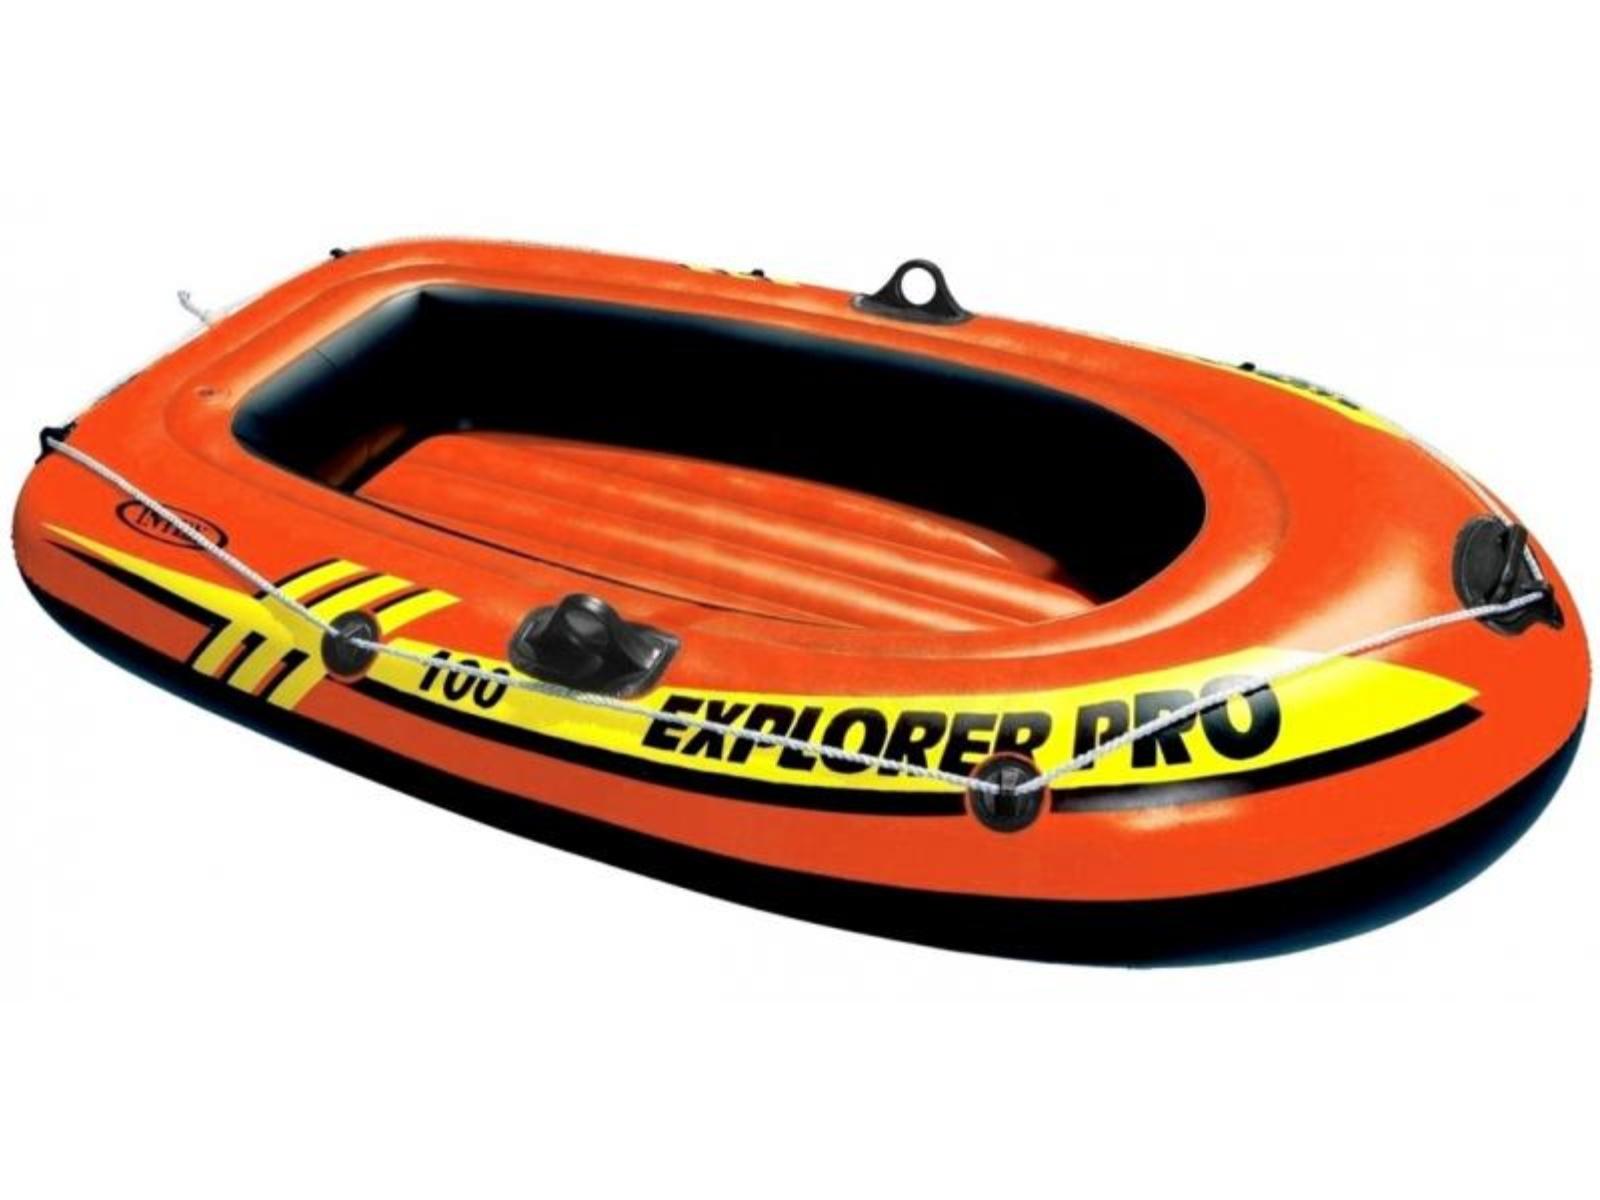 Nafukovací čln INTEX Explorer Pro 100